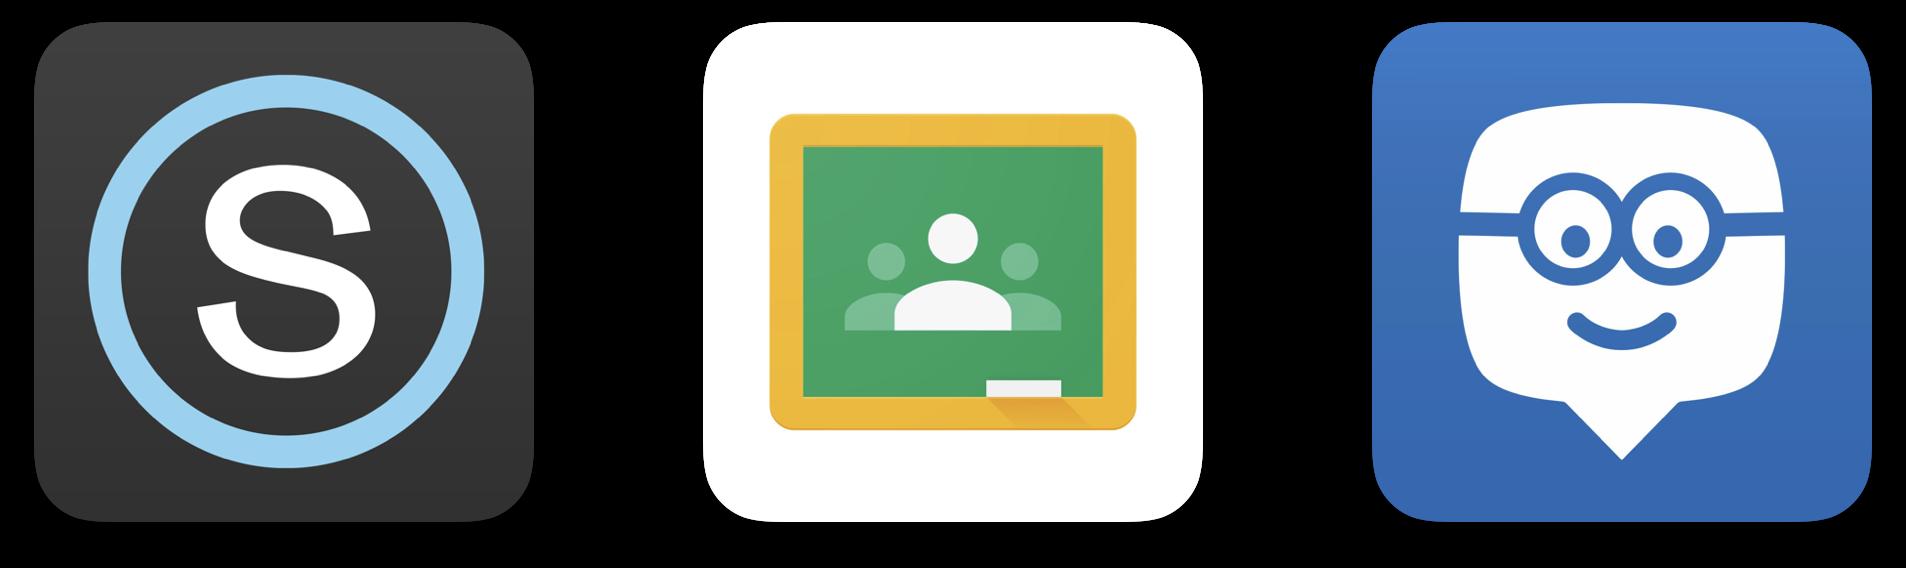 Edmodo0, GOogle CLassroom, and Schoology Logos